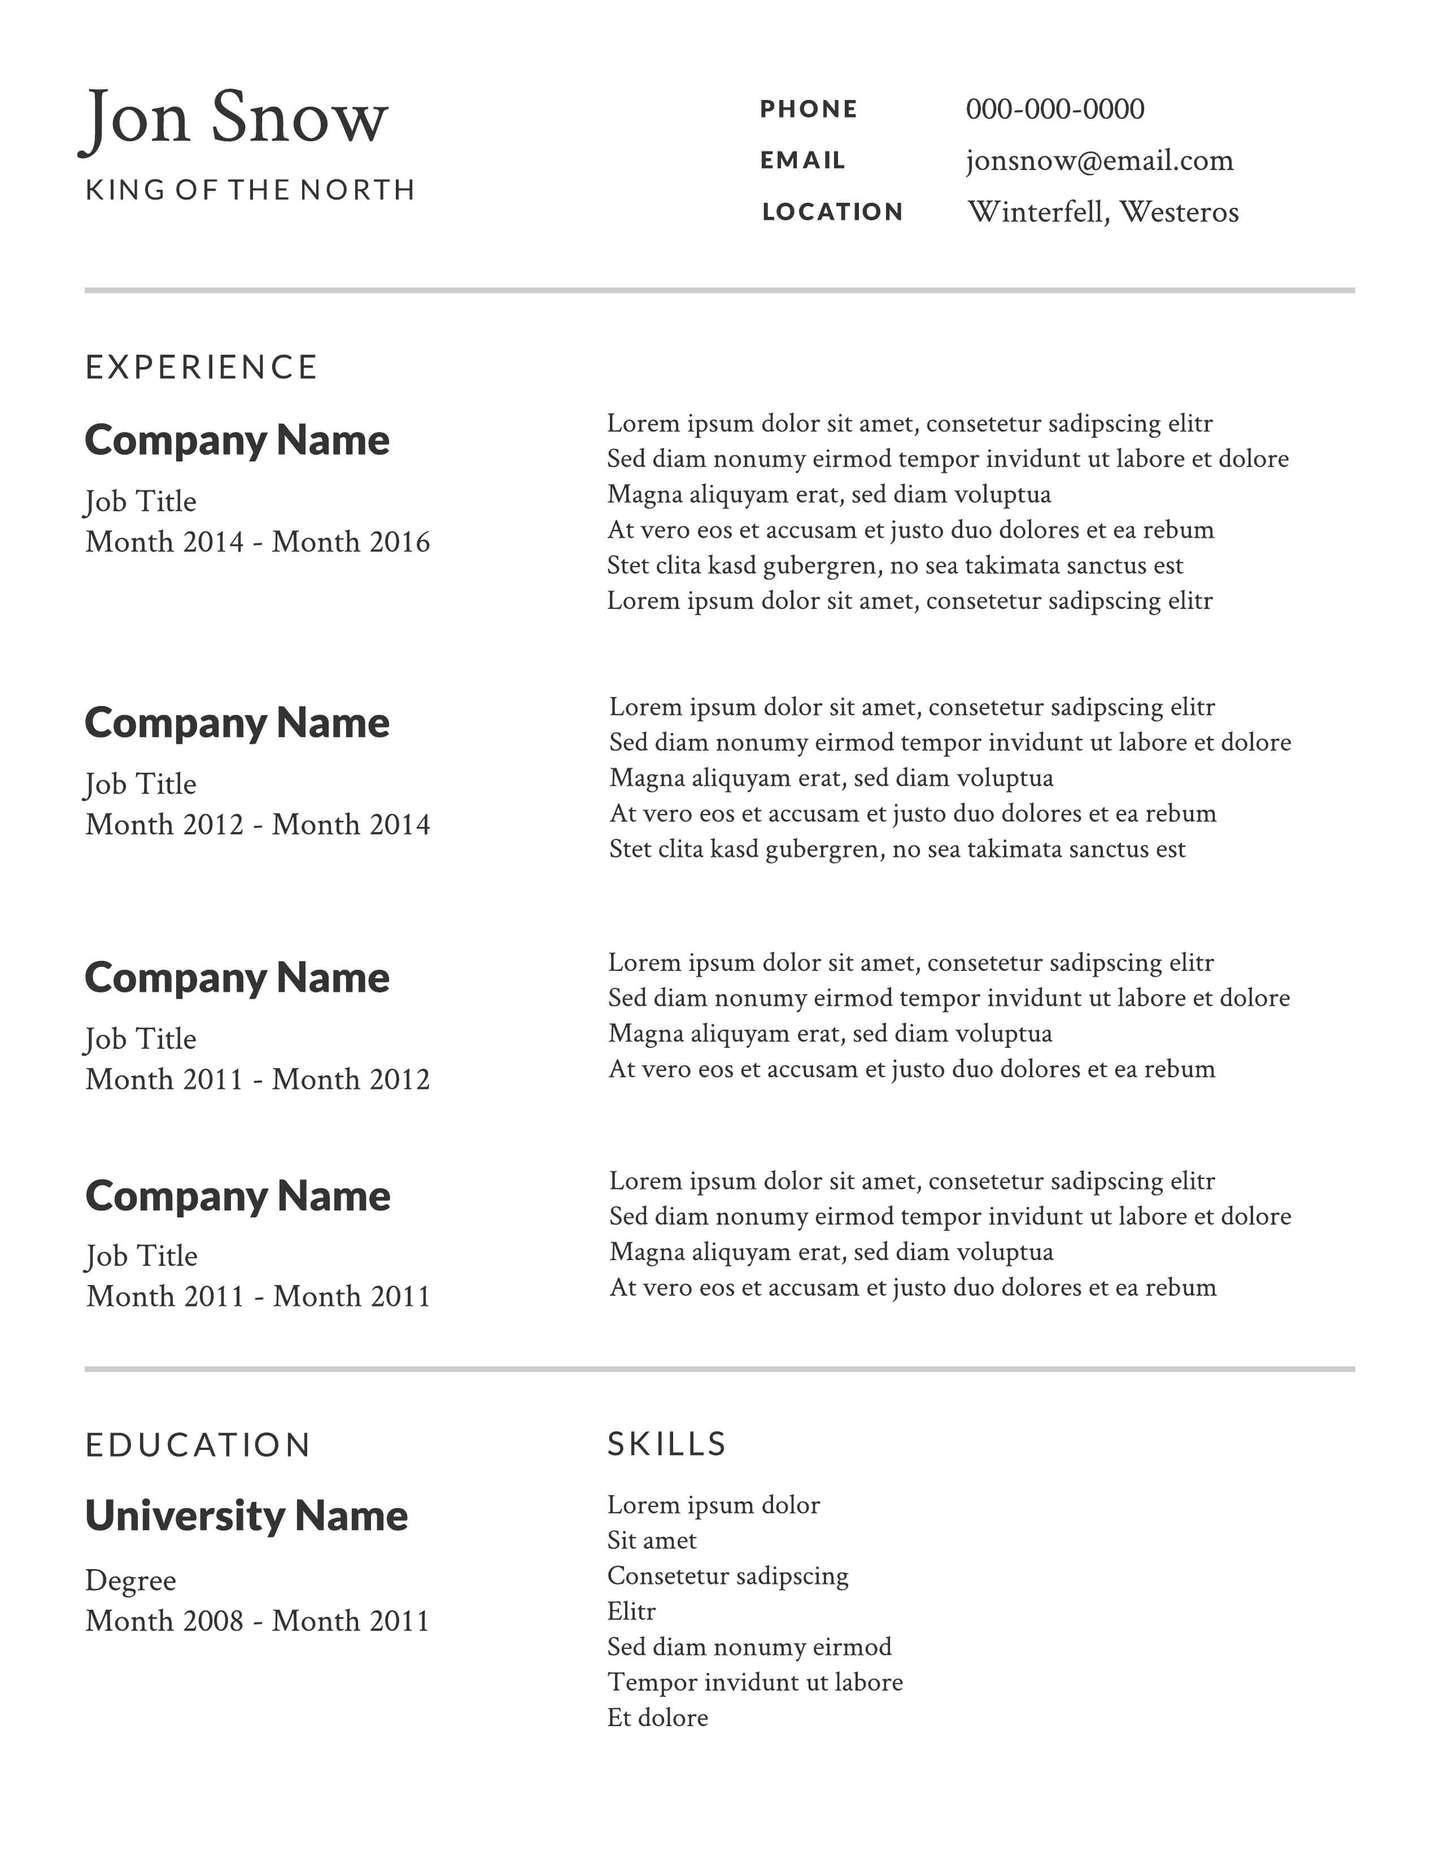 Resume Template Free Resume Professional2x resume template free|wikiresume.com